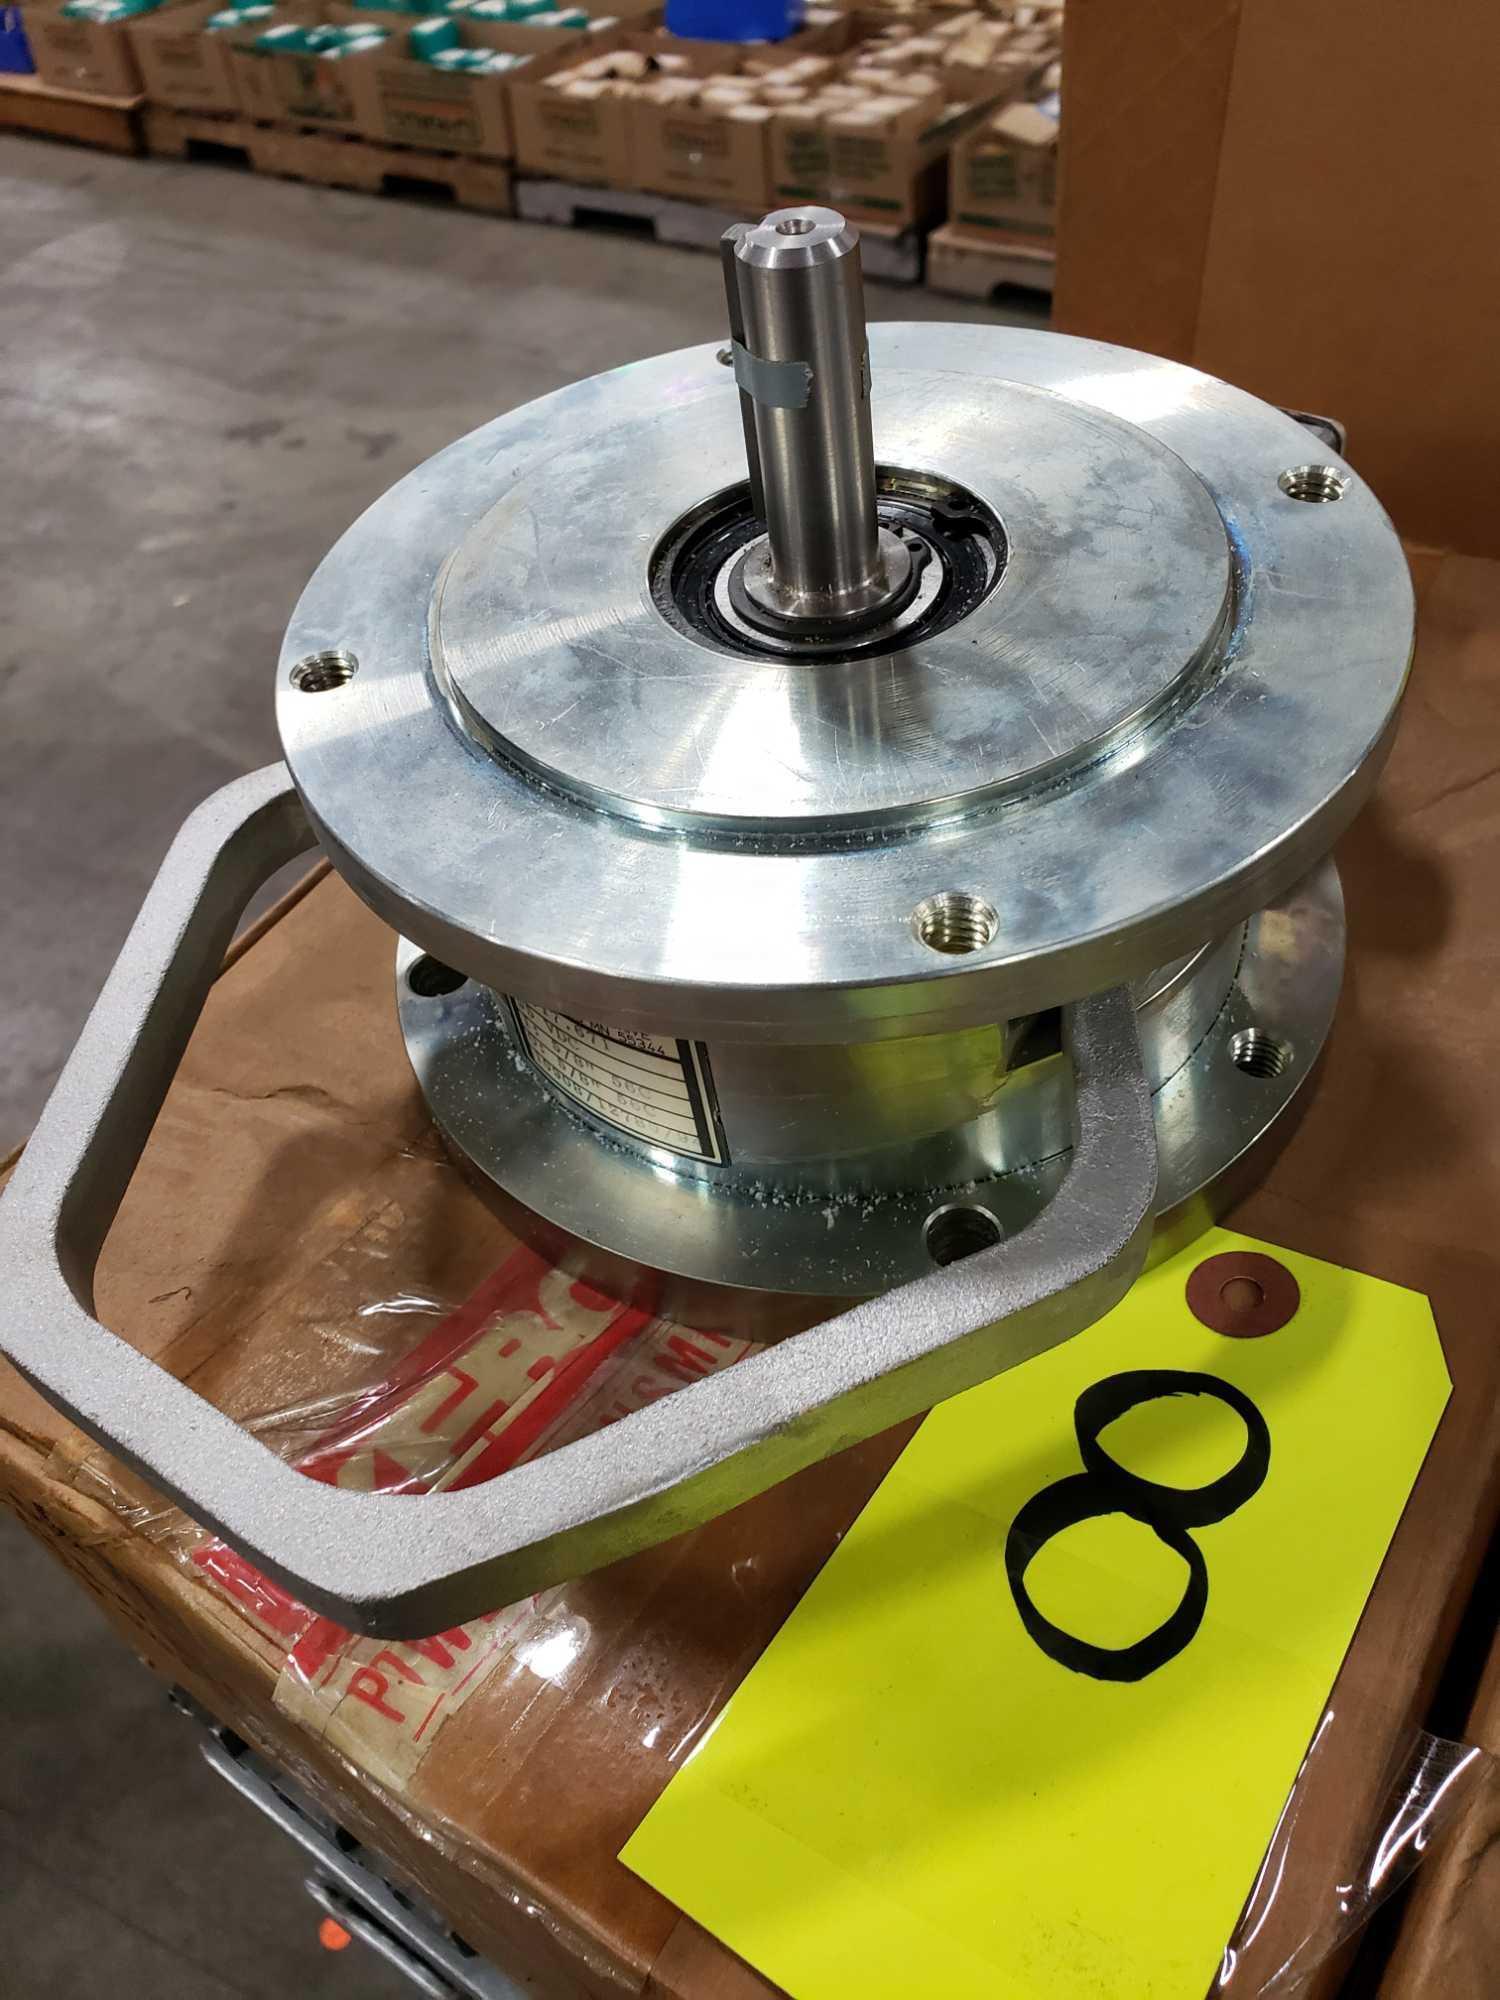 Kebco brake model 04.17.671, 95vdc, 56c output, 56c input. New in box. - Image 3 of 3